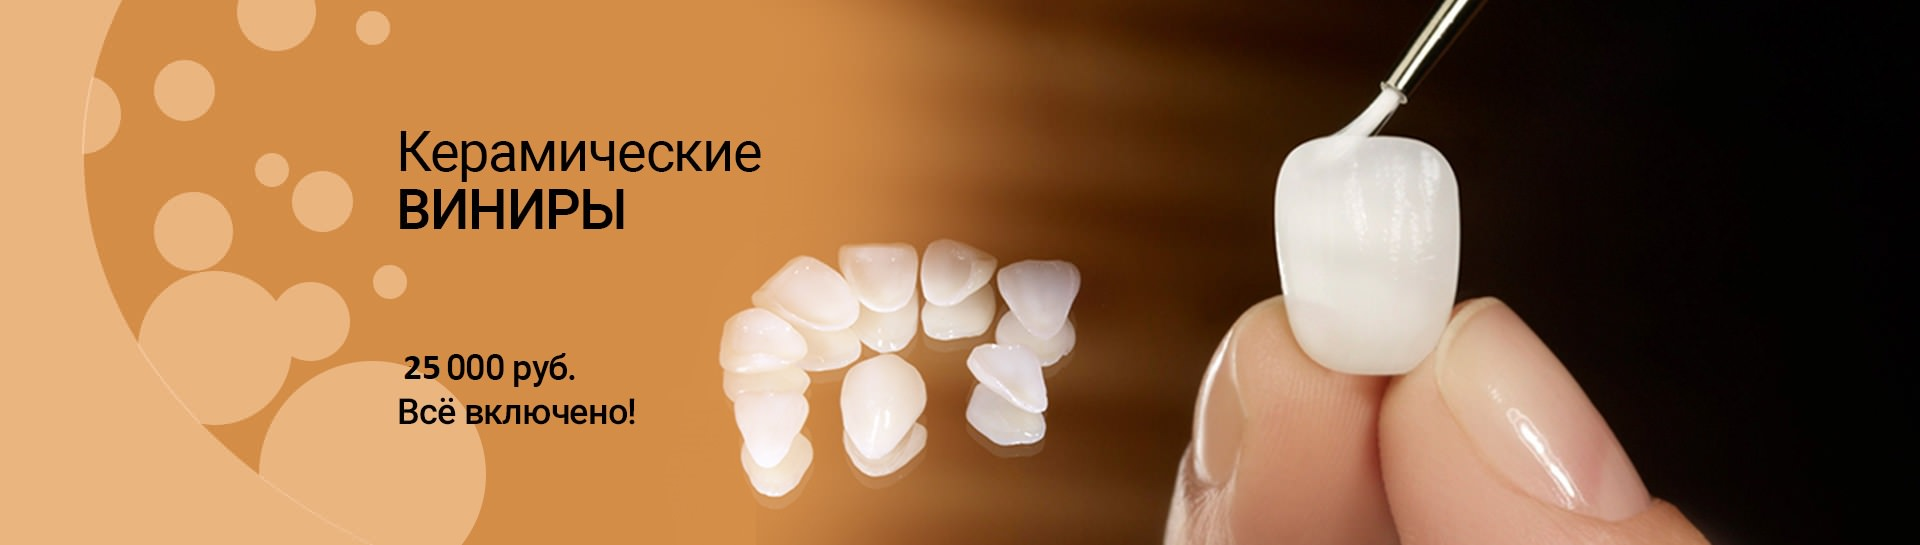 https://denta-maryino.ru/wp-content/uploads/vinirs-akcija.jpg 1x, https://denta-maryino.ru/wp-content/cache/thumb/a8/fd6be8cff989ea8_1320x545.jpg 1320w